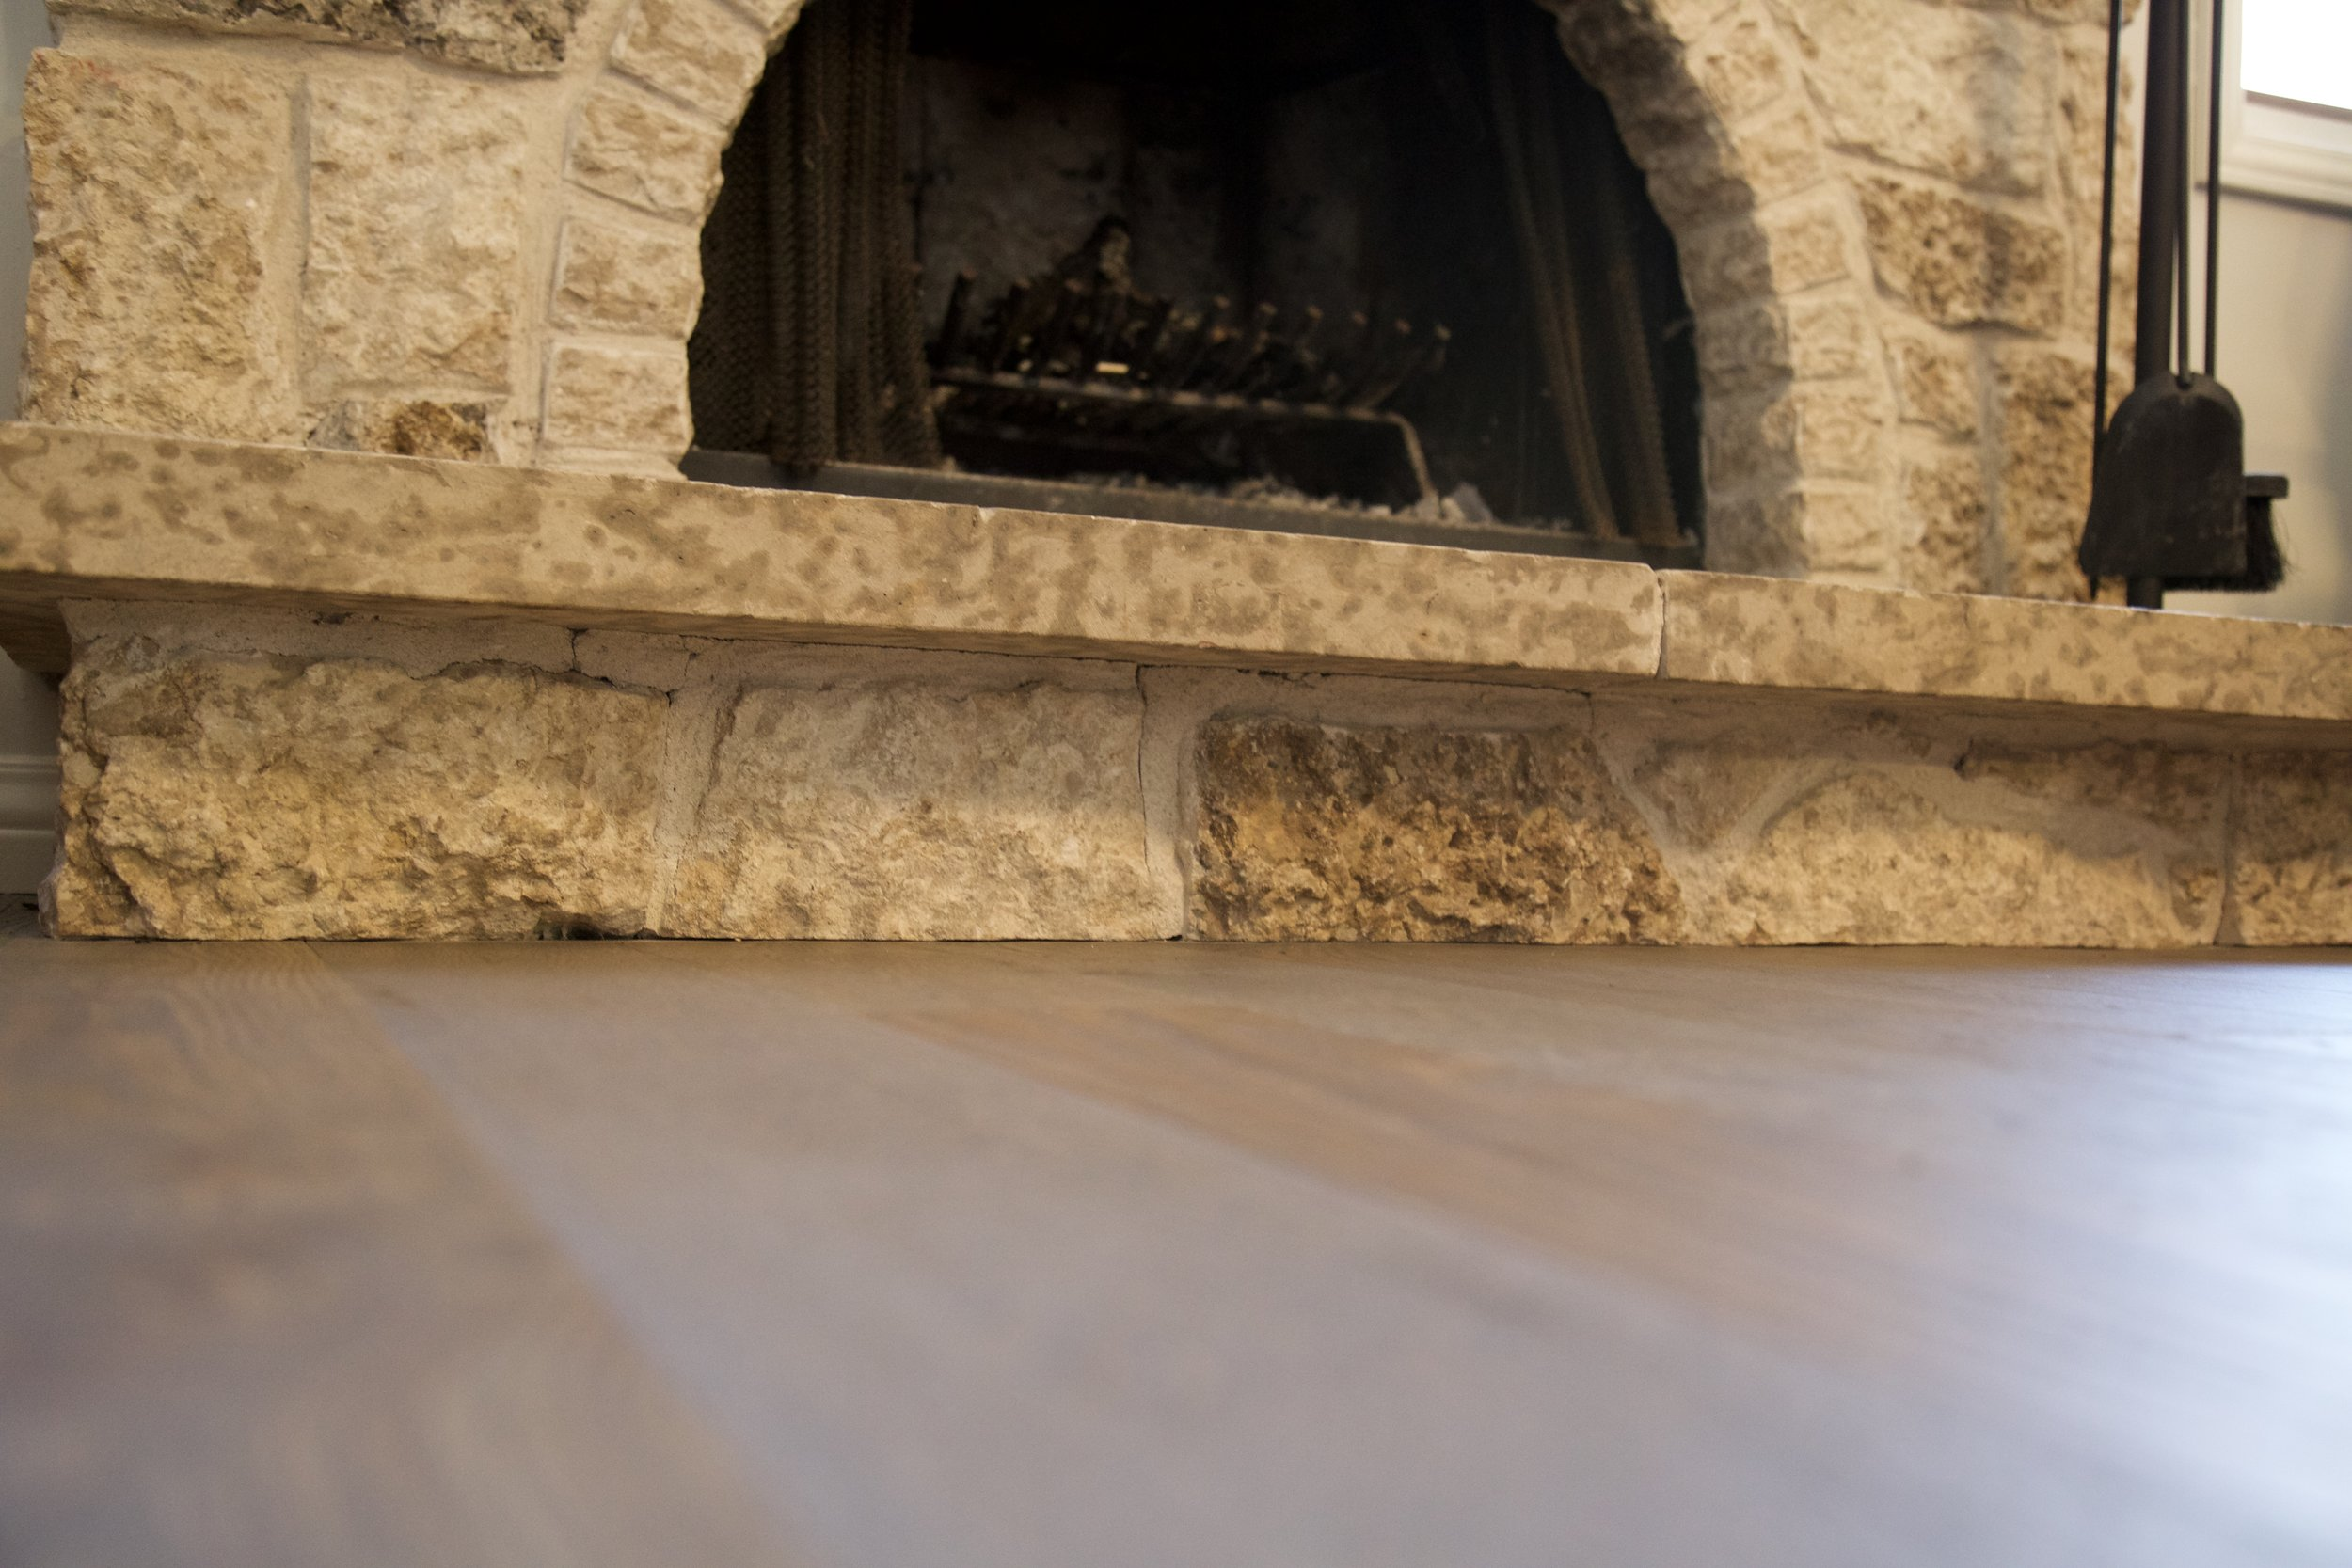 Custom Harwood install. Undercut existing brick for smooth seamles look.